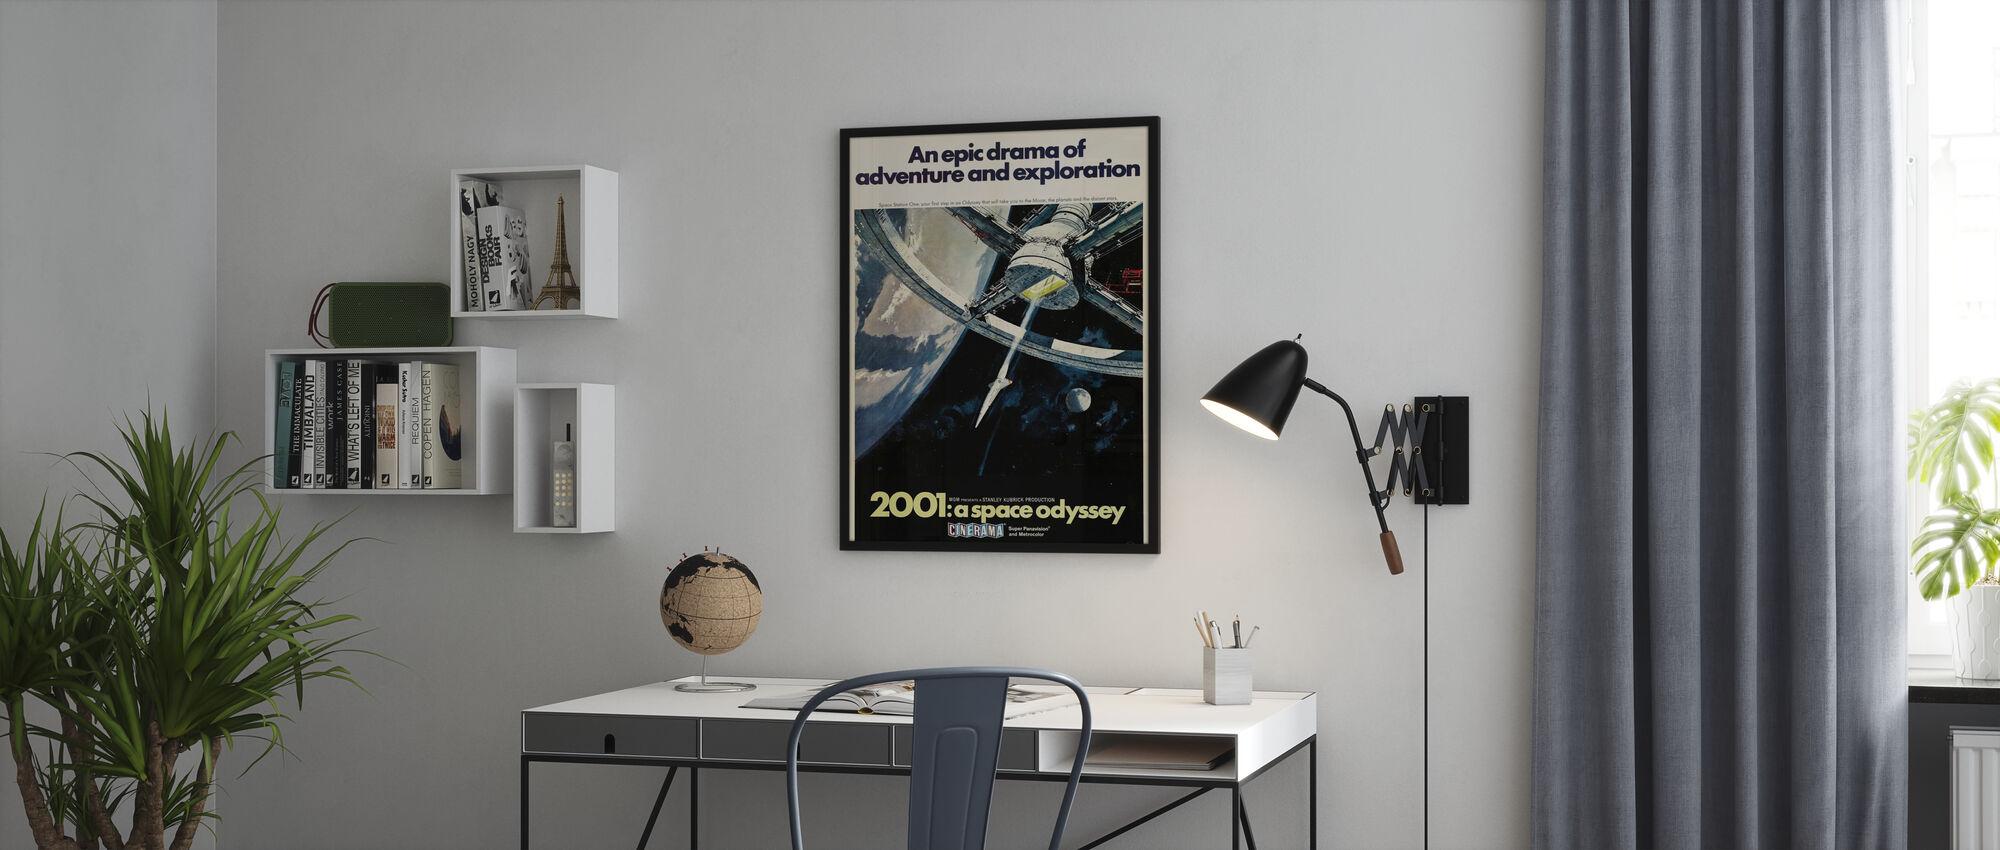 2001 En rymd Odyssey - Poster - Kontor